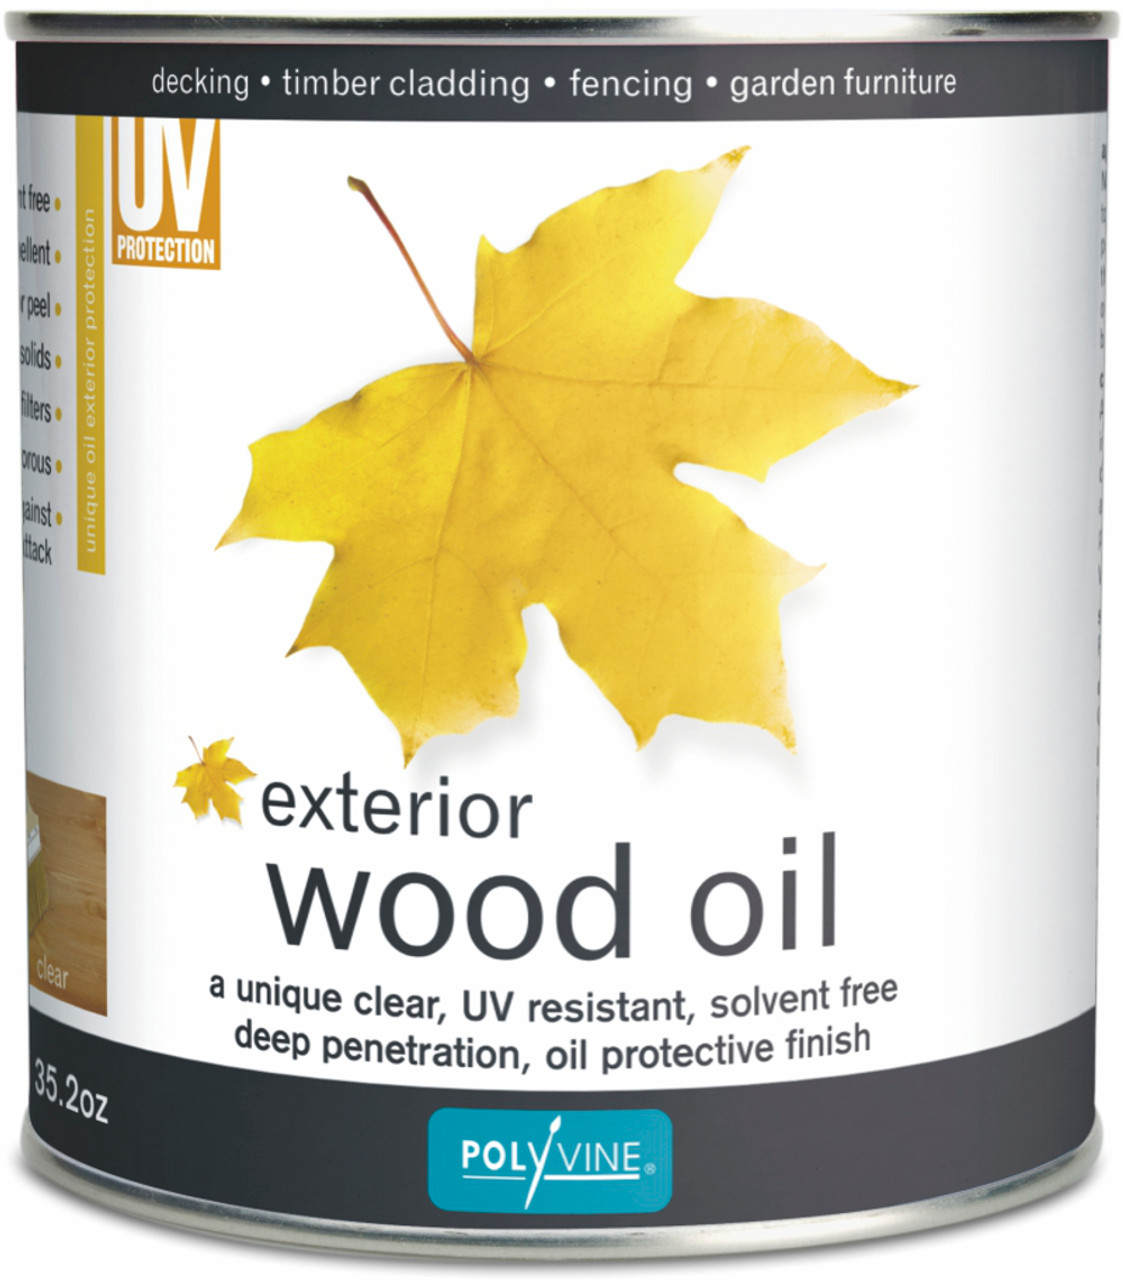 Polyvine Exterior Wood Oil - Translucent Finish